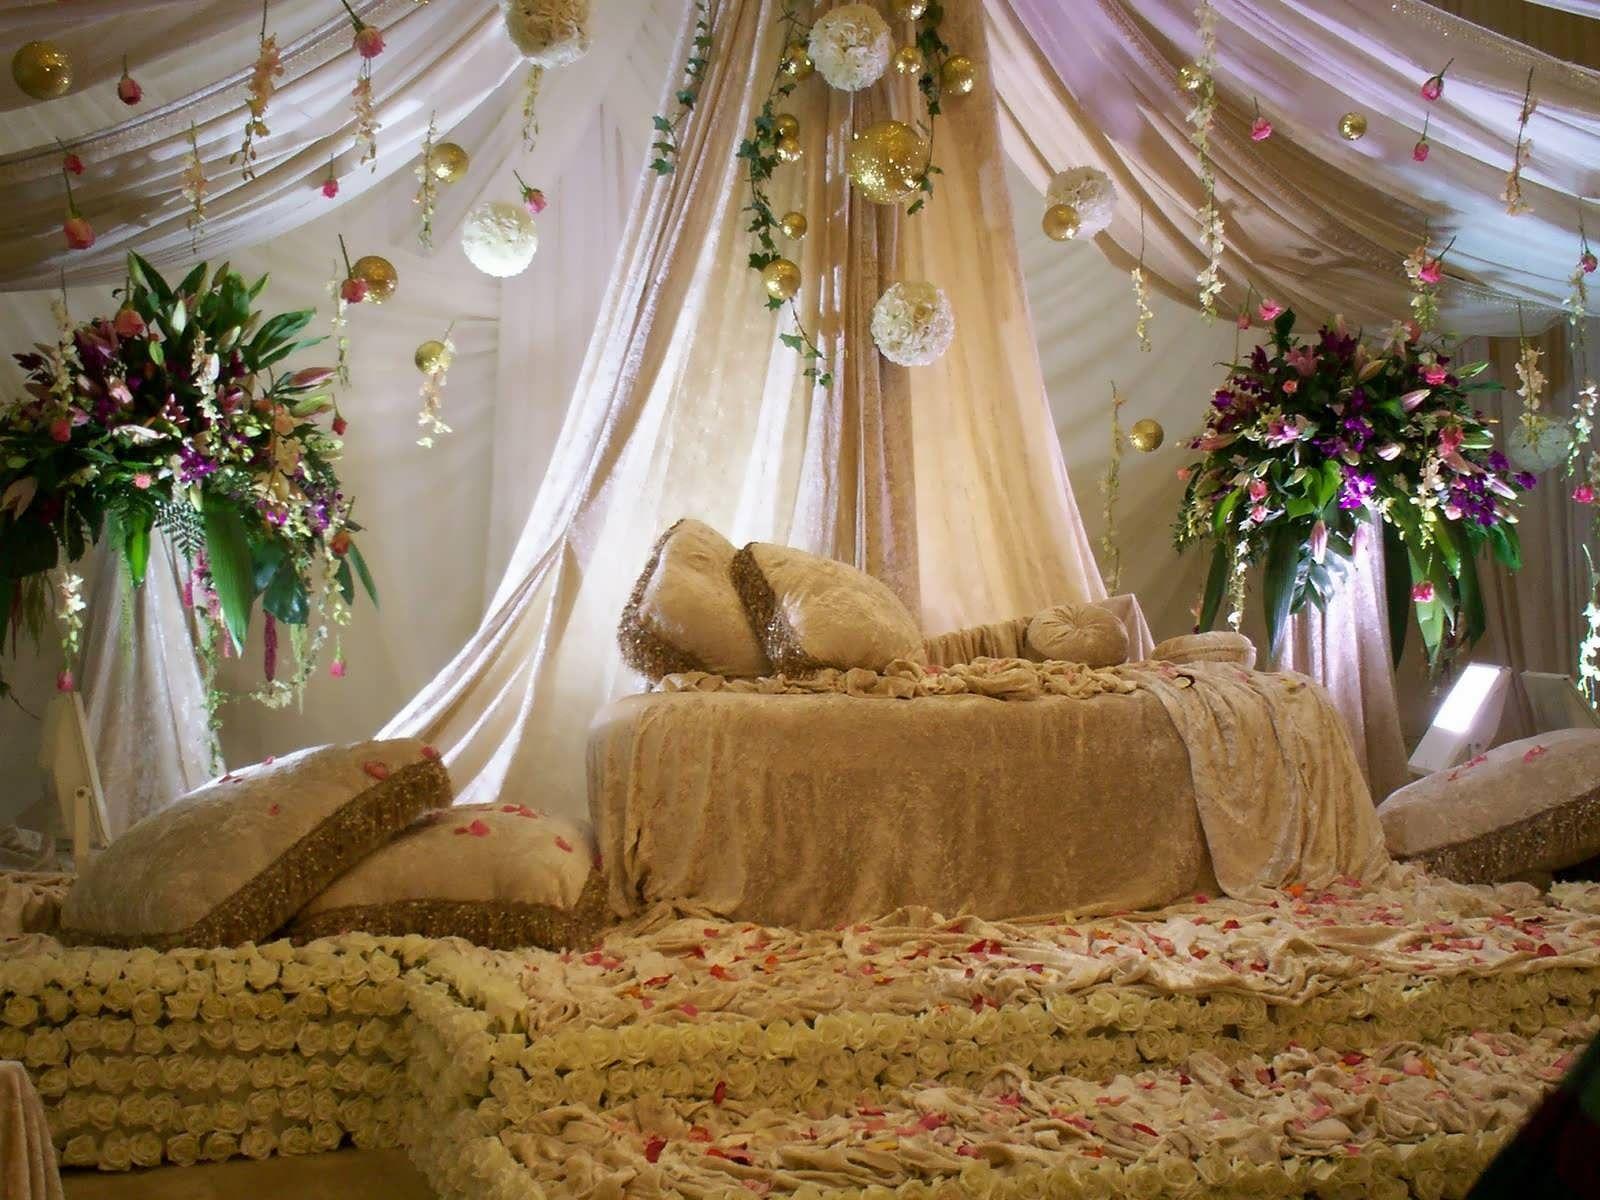 Best Wedding Decorations Ideas on a Budget - 99 Wedding Ideas ...